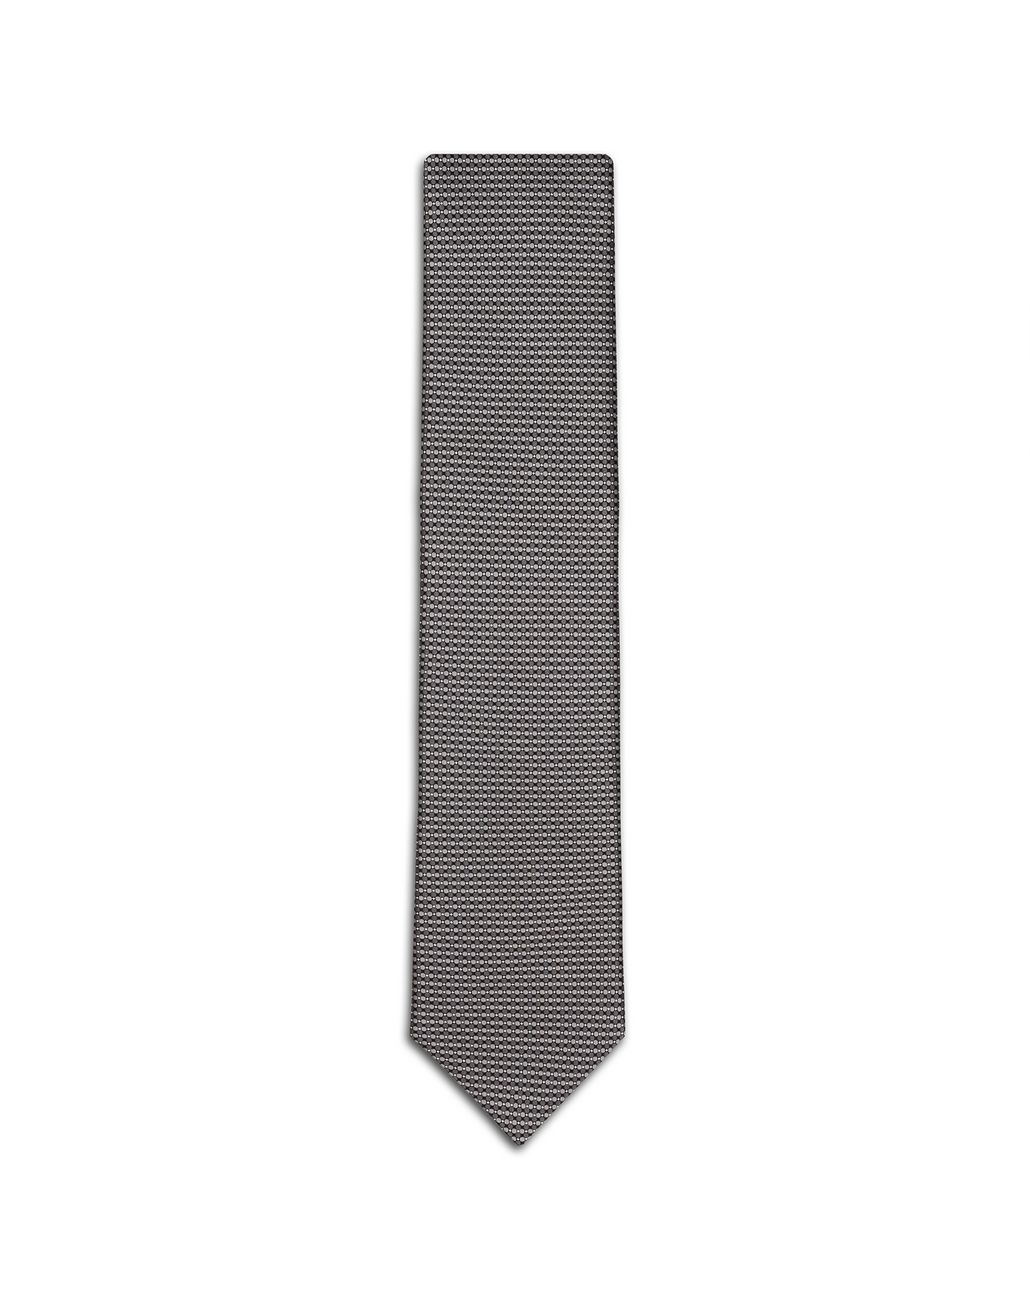 BRIONI Серый галстук с микроузором Галстук Для Мужчин f